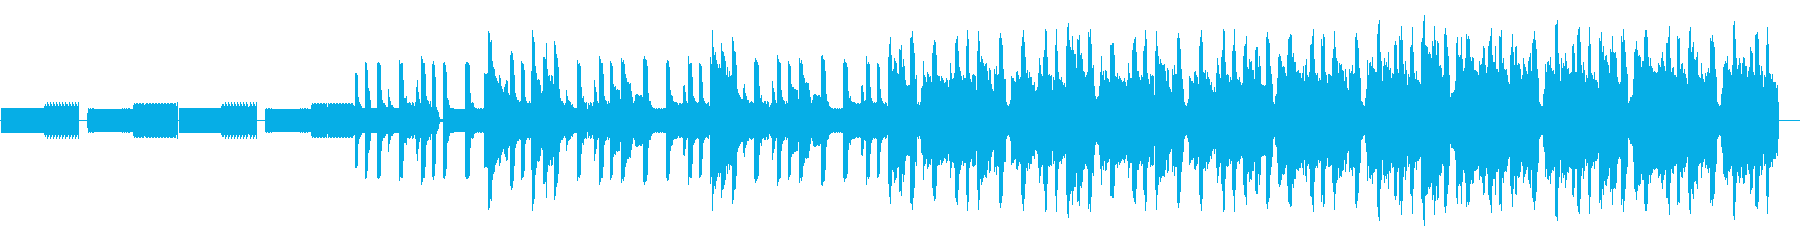 8bitリフのループとコミカルなシンセの再生済みの波形